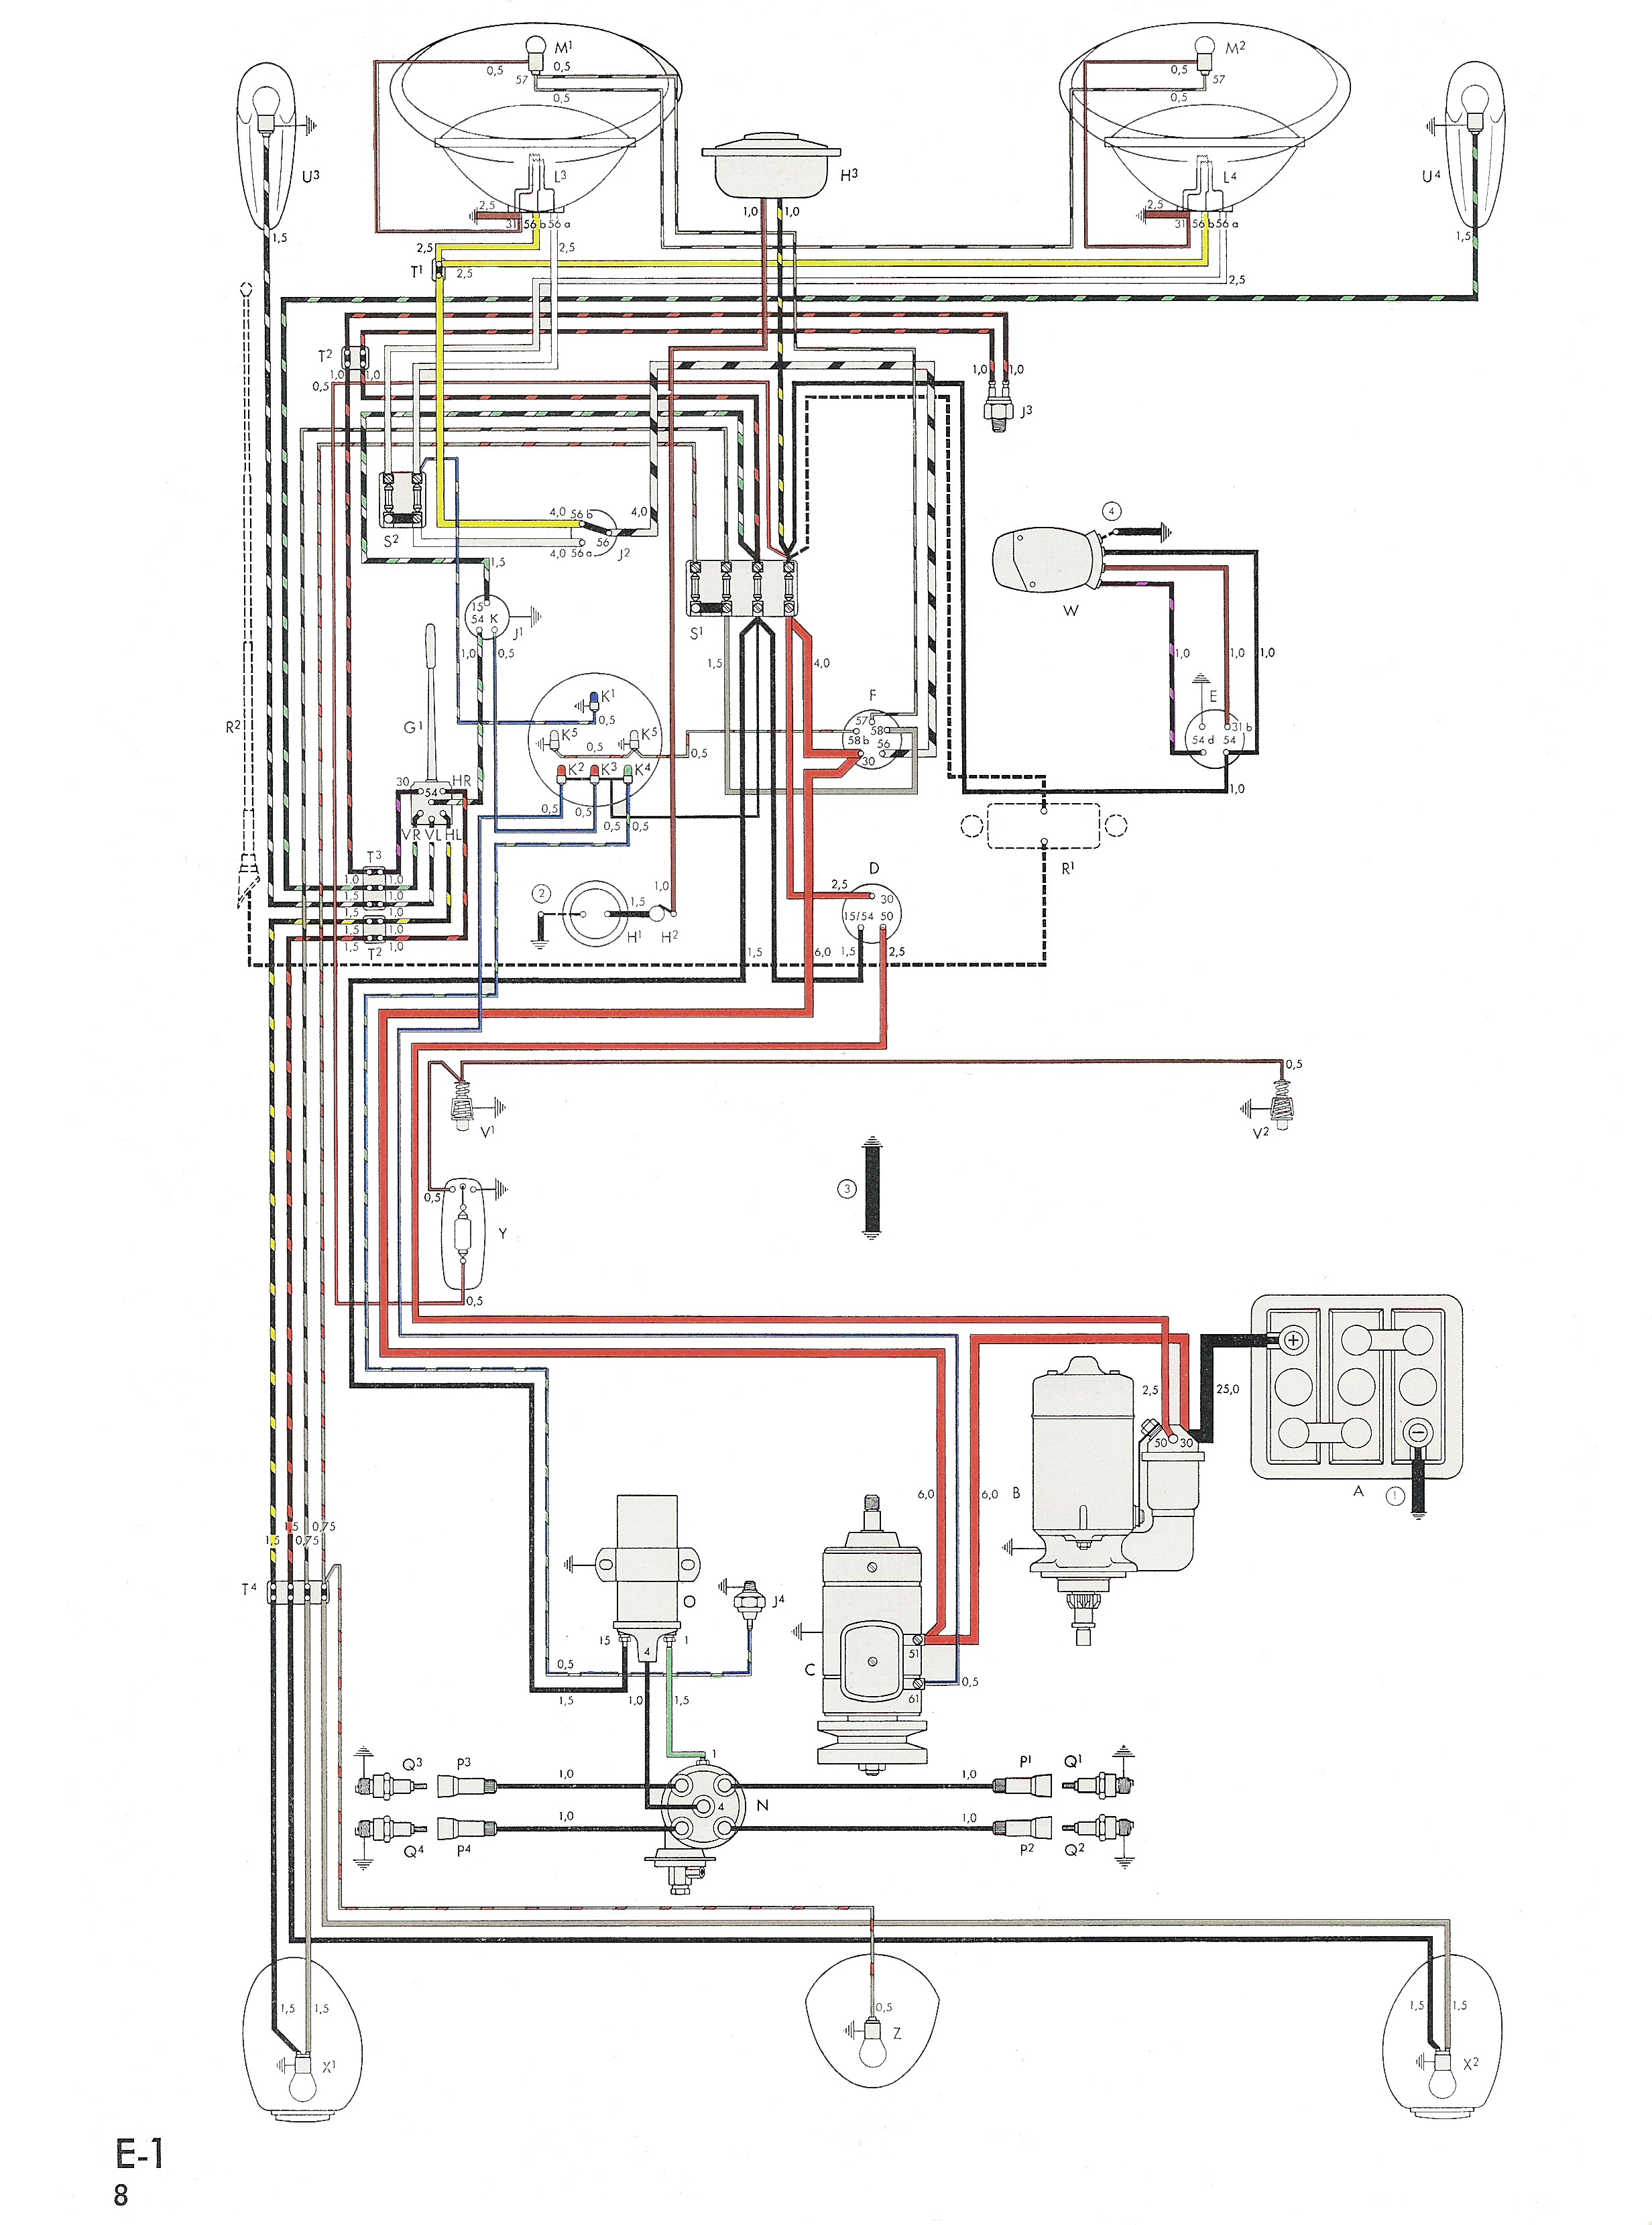 2000 Vw Beetle Parts Diagram Wiring Diagram In Addition Vw Beetle Voltage Regulator Wiring Of 2000 Vw Beetle Parts Diagram